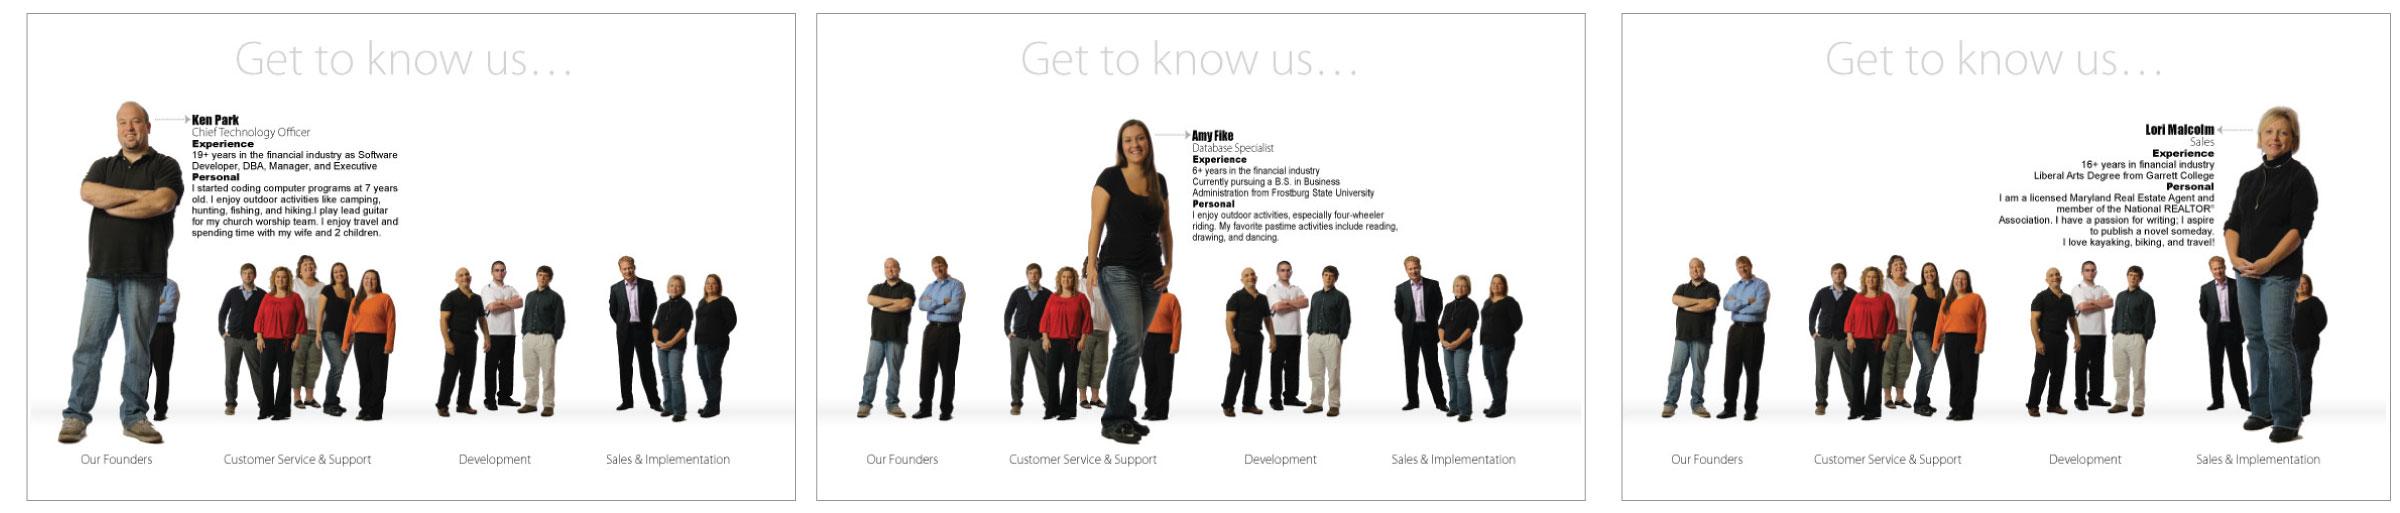 AssetBook Employee Photos [fish-eye effect, bio and figure pop up]